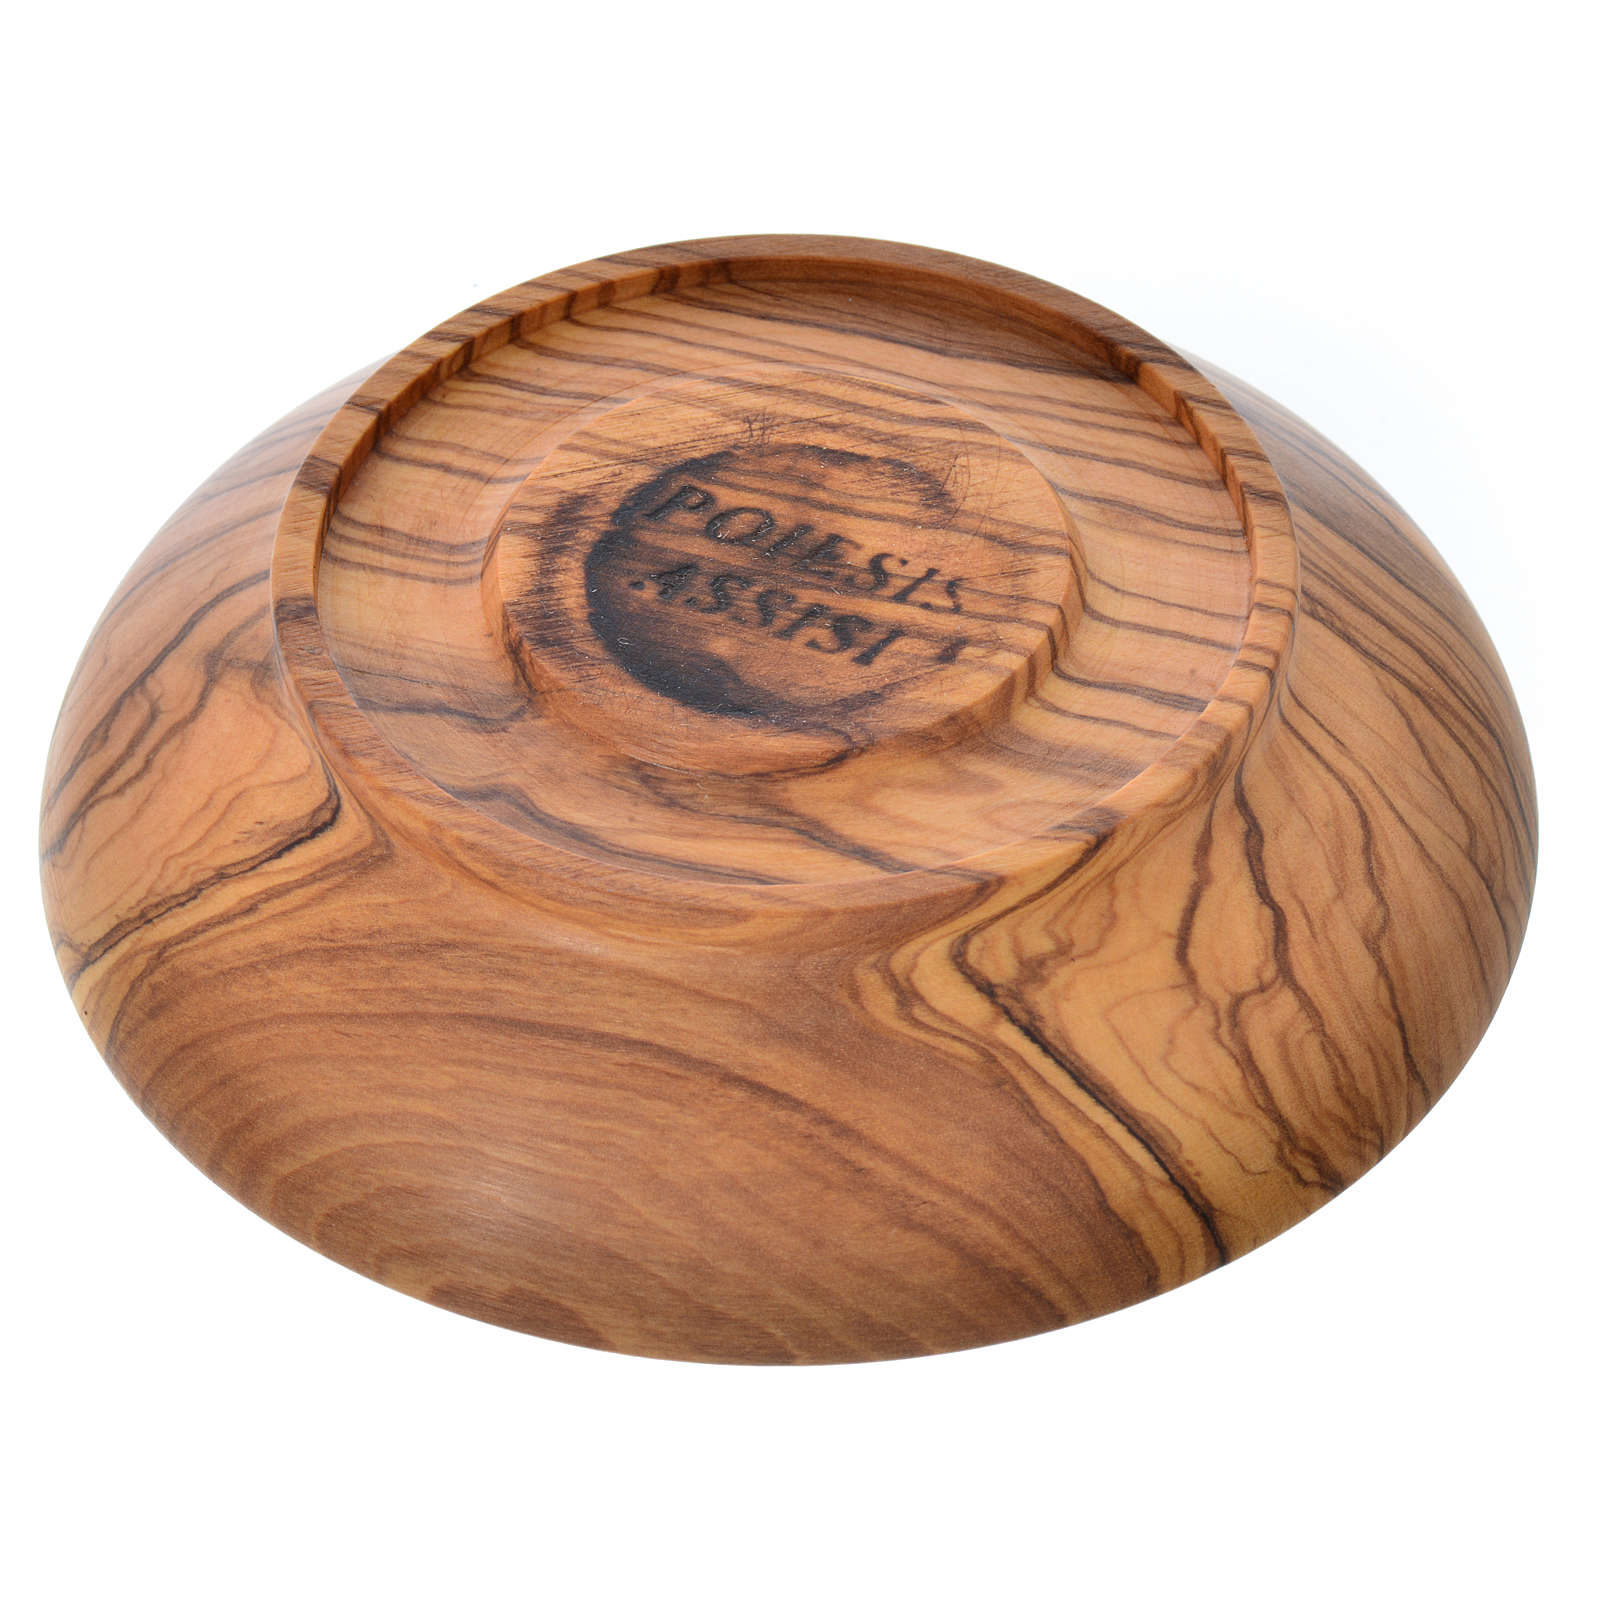 Patena de madera estacionada de olivo de Asís diámetro 10.5cm 4